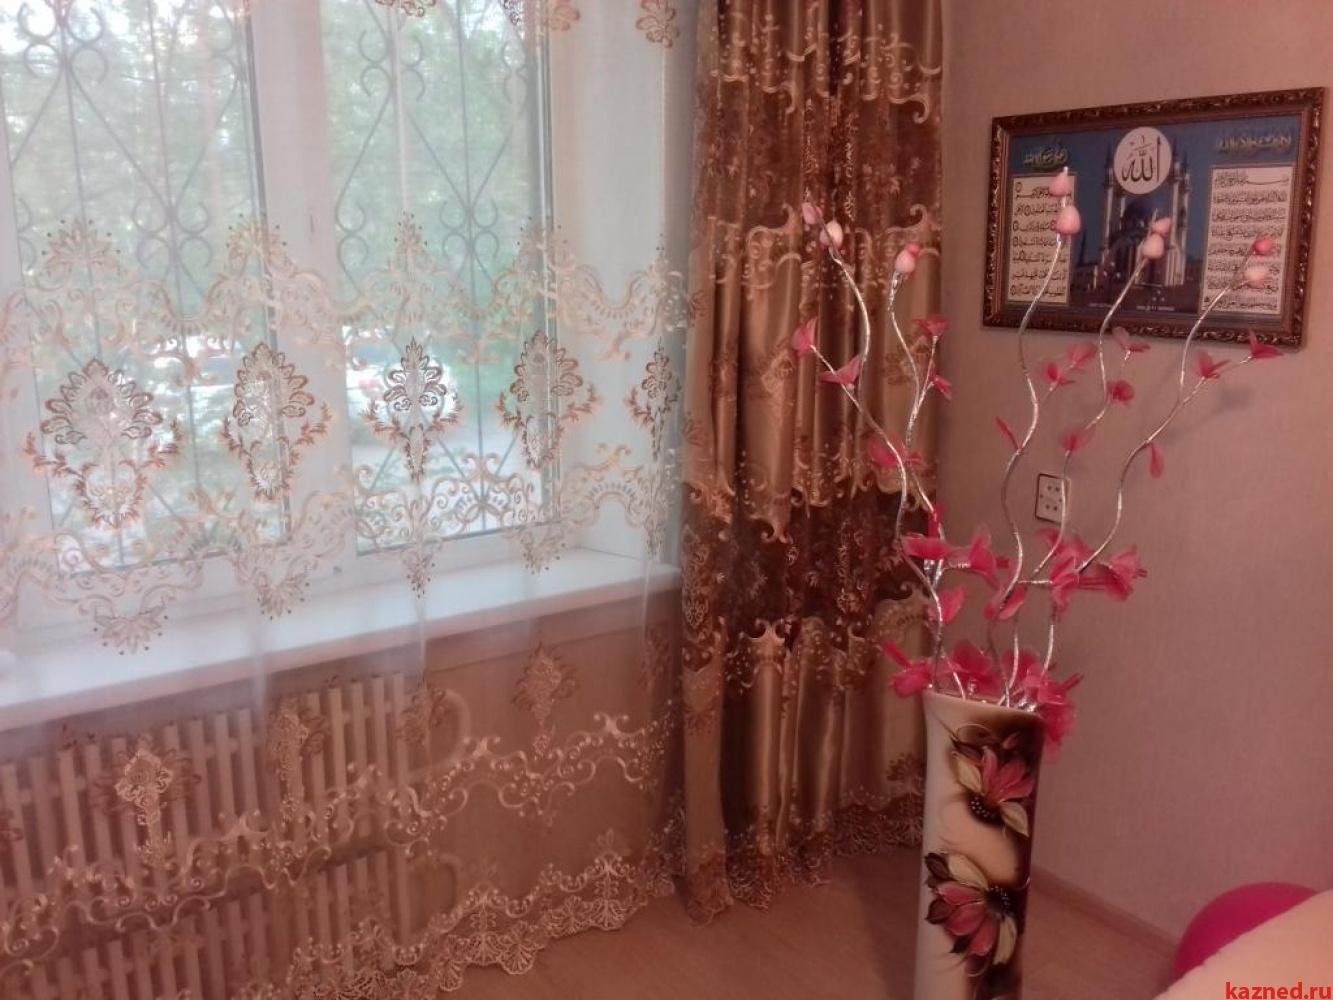 Продажа 3-к квартиры Лукина, 16, 69 м² (миниатюра №3)